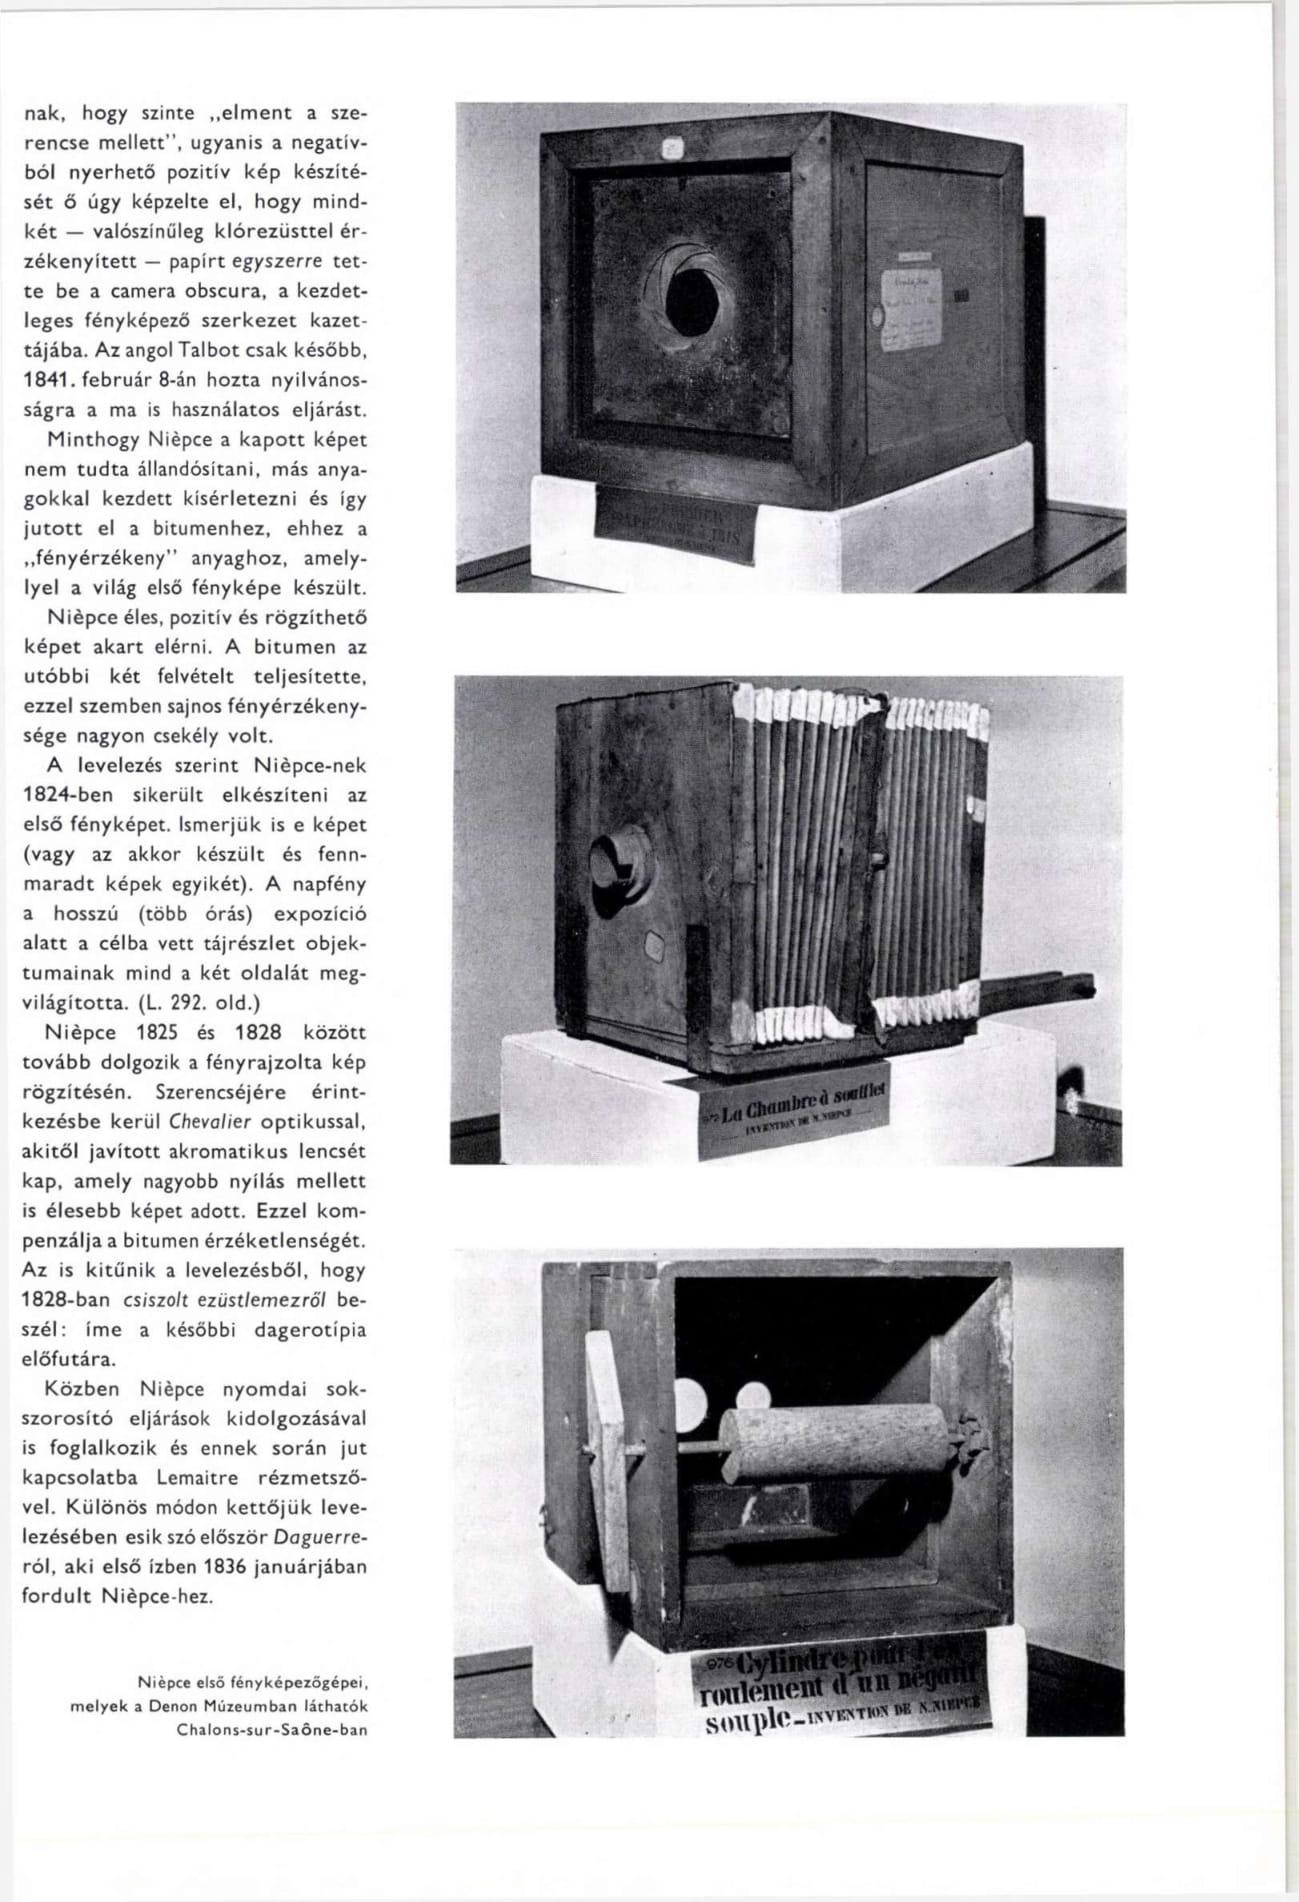 Foto, XIII. évfolyam, 1966. július<br />291. o.<br /><br />forrás: arcanum.hu